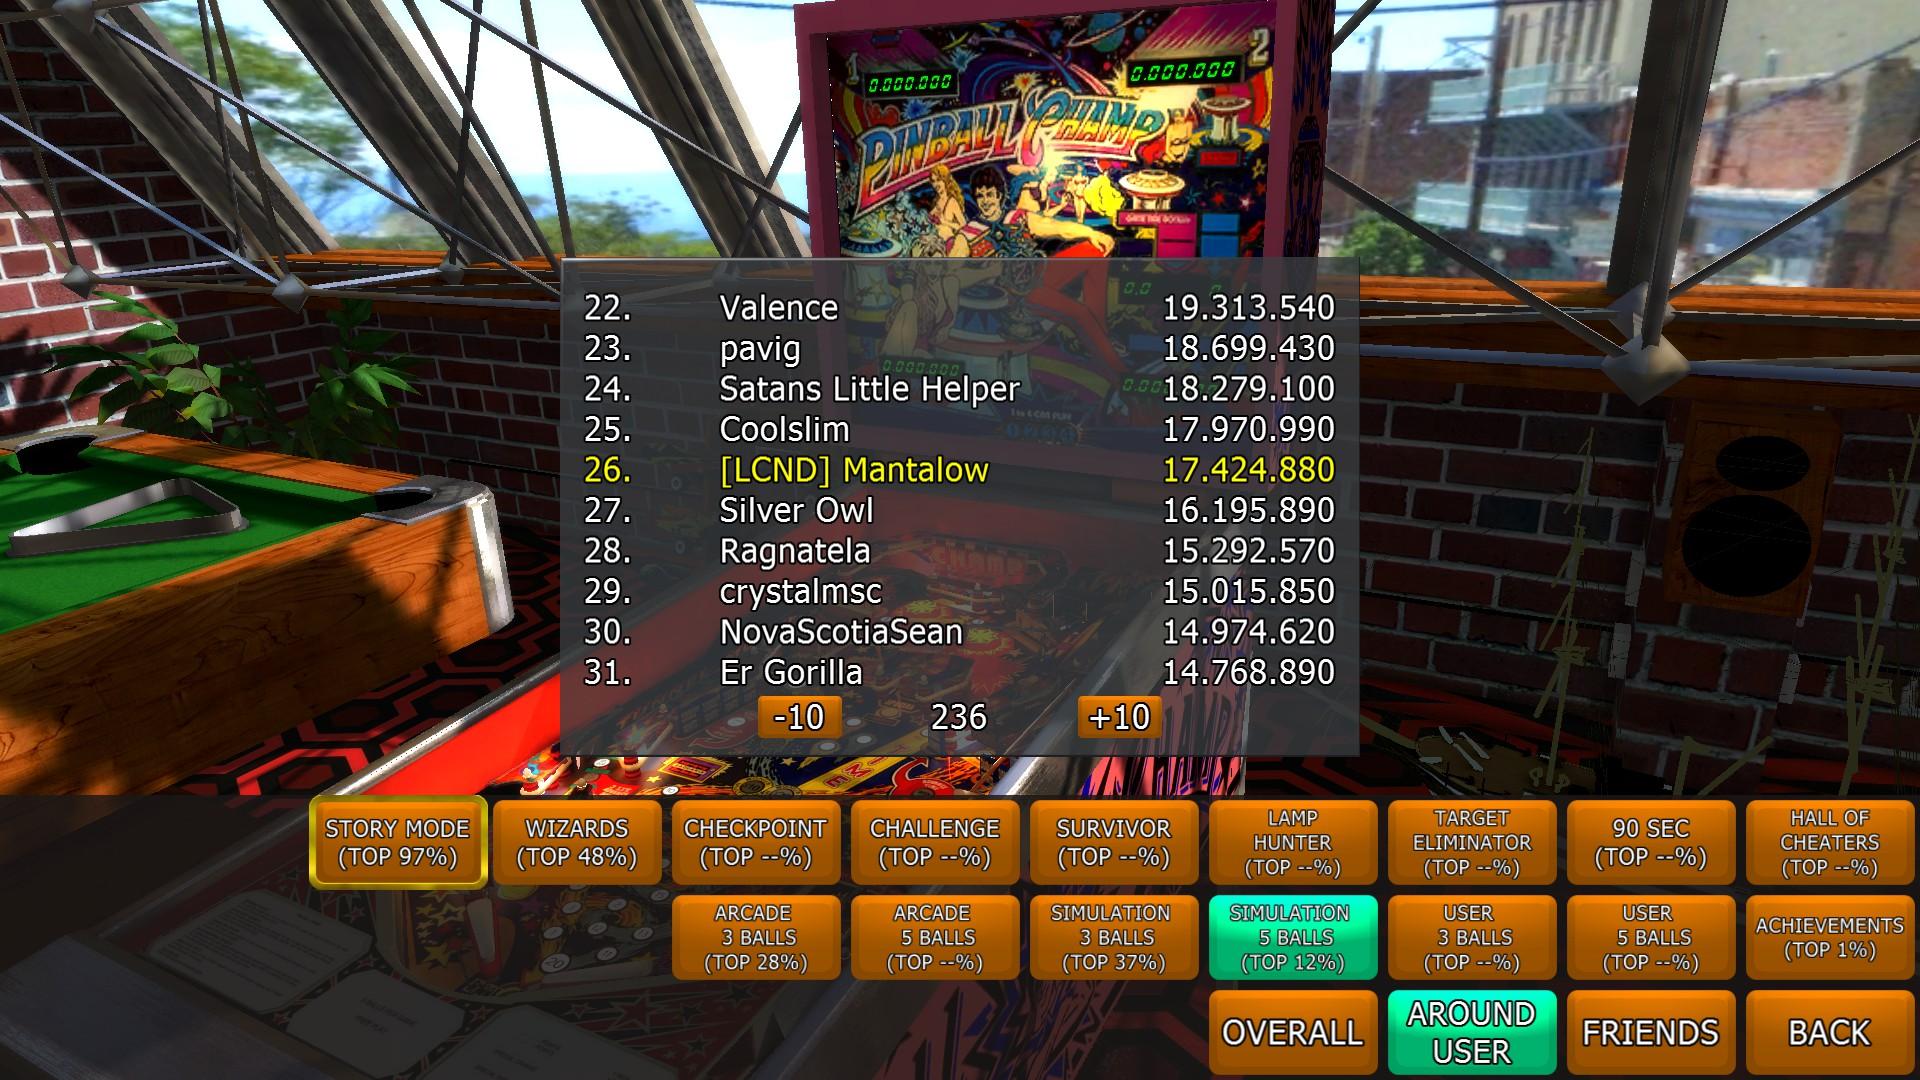 Mantalow: Zaccaria Pinball: Pinball Champ